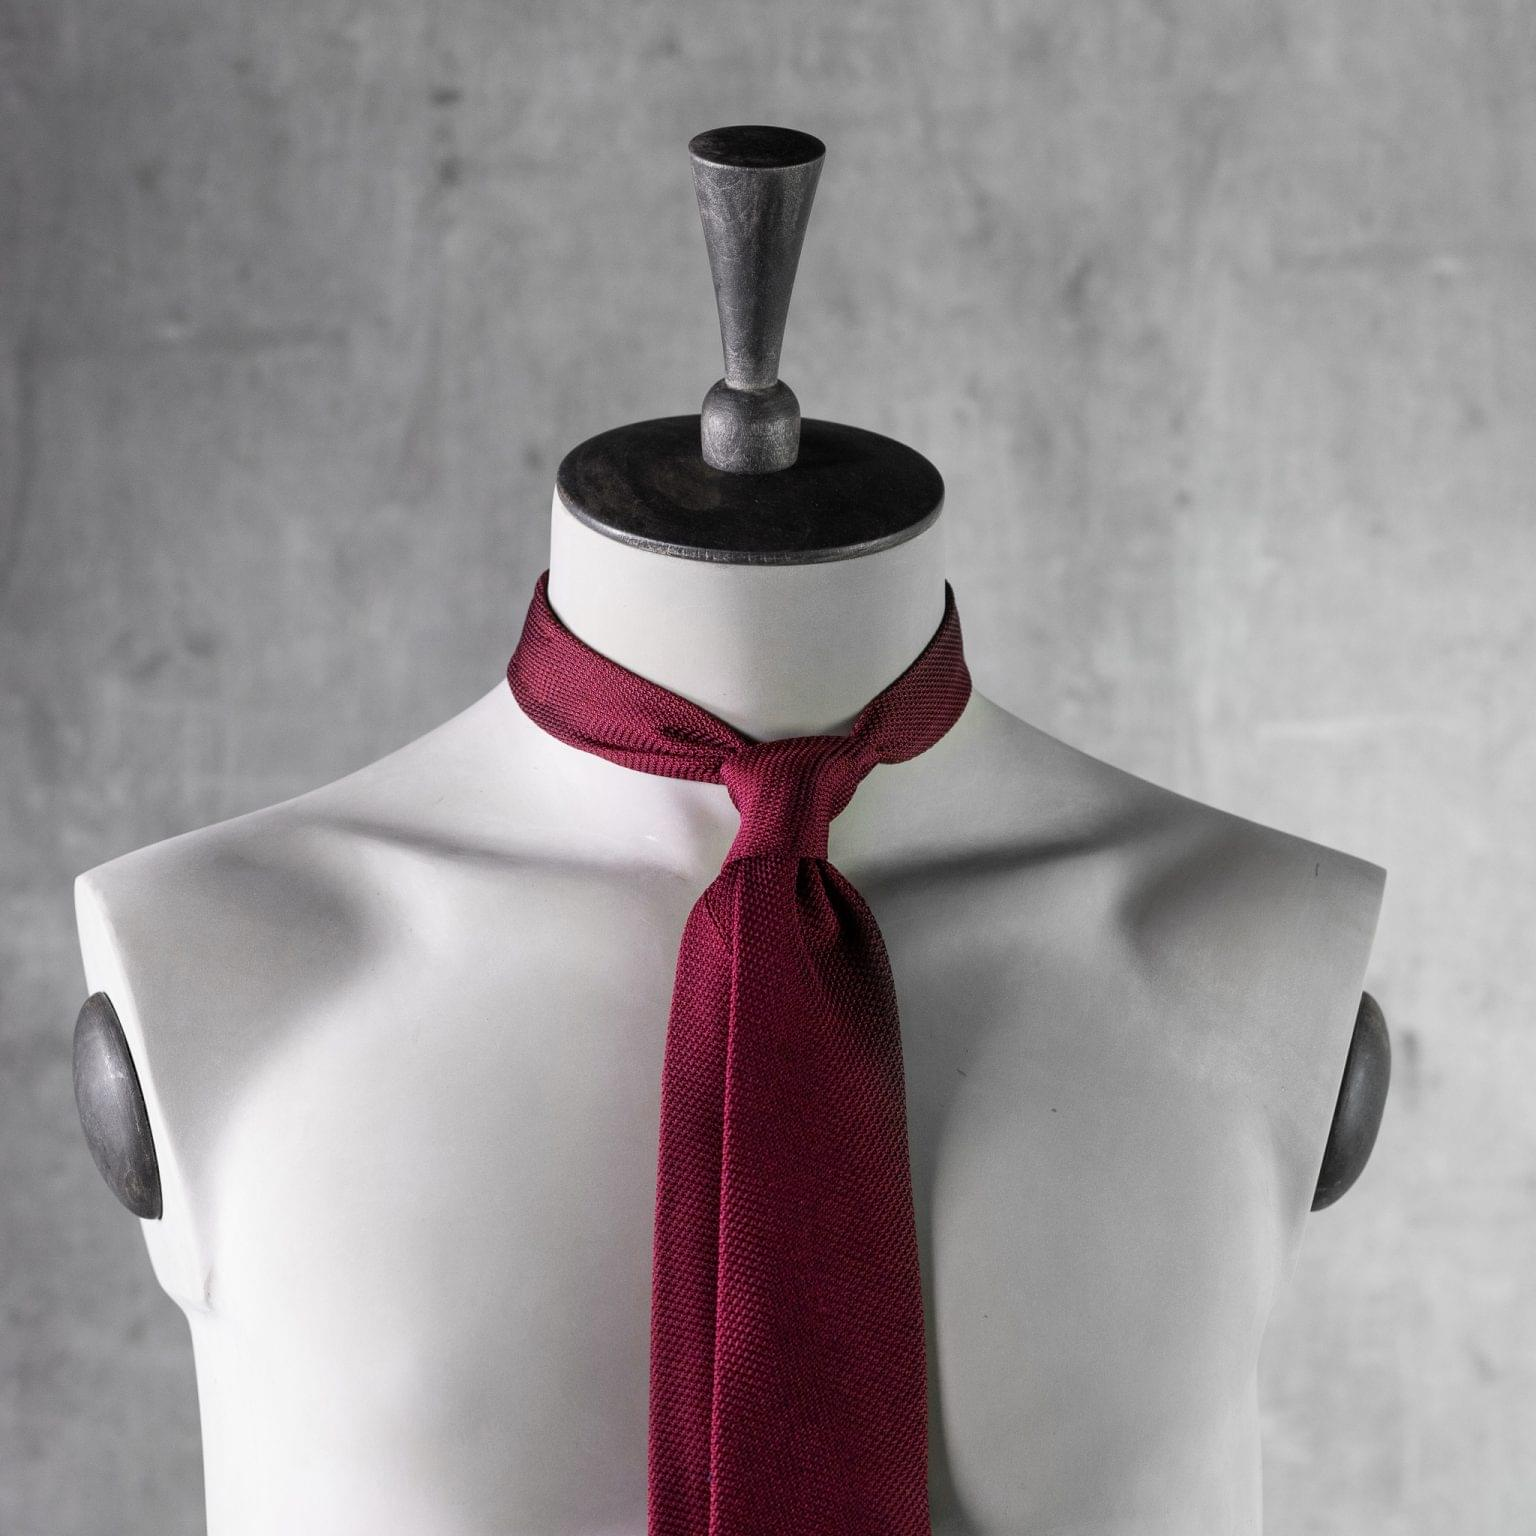 GRENADINE-0278-Tie-Initials-Corbata-Iniciales-The-Seelk-3